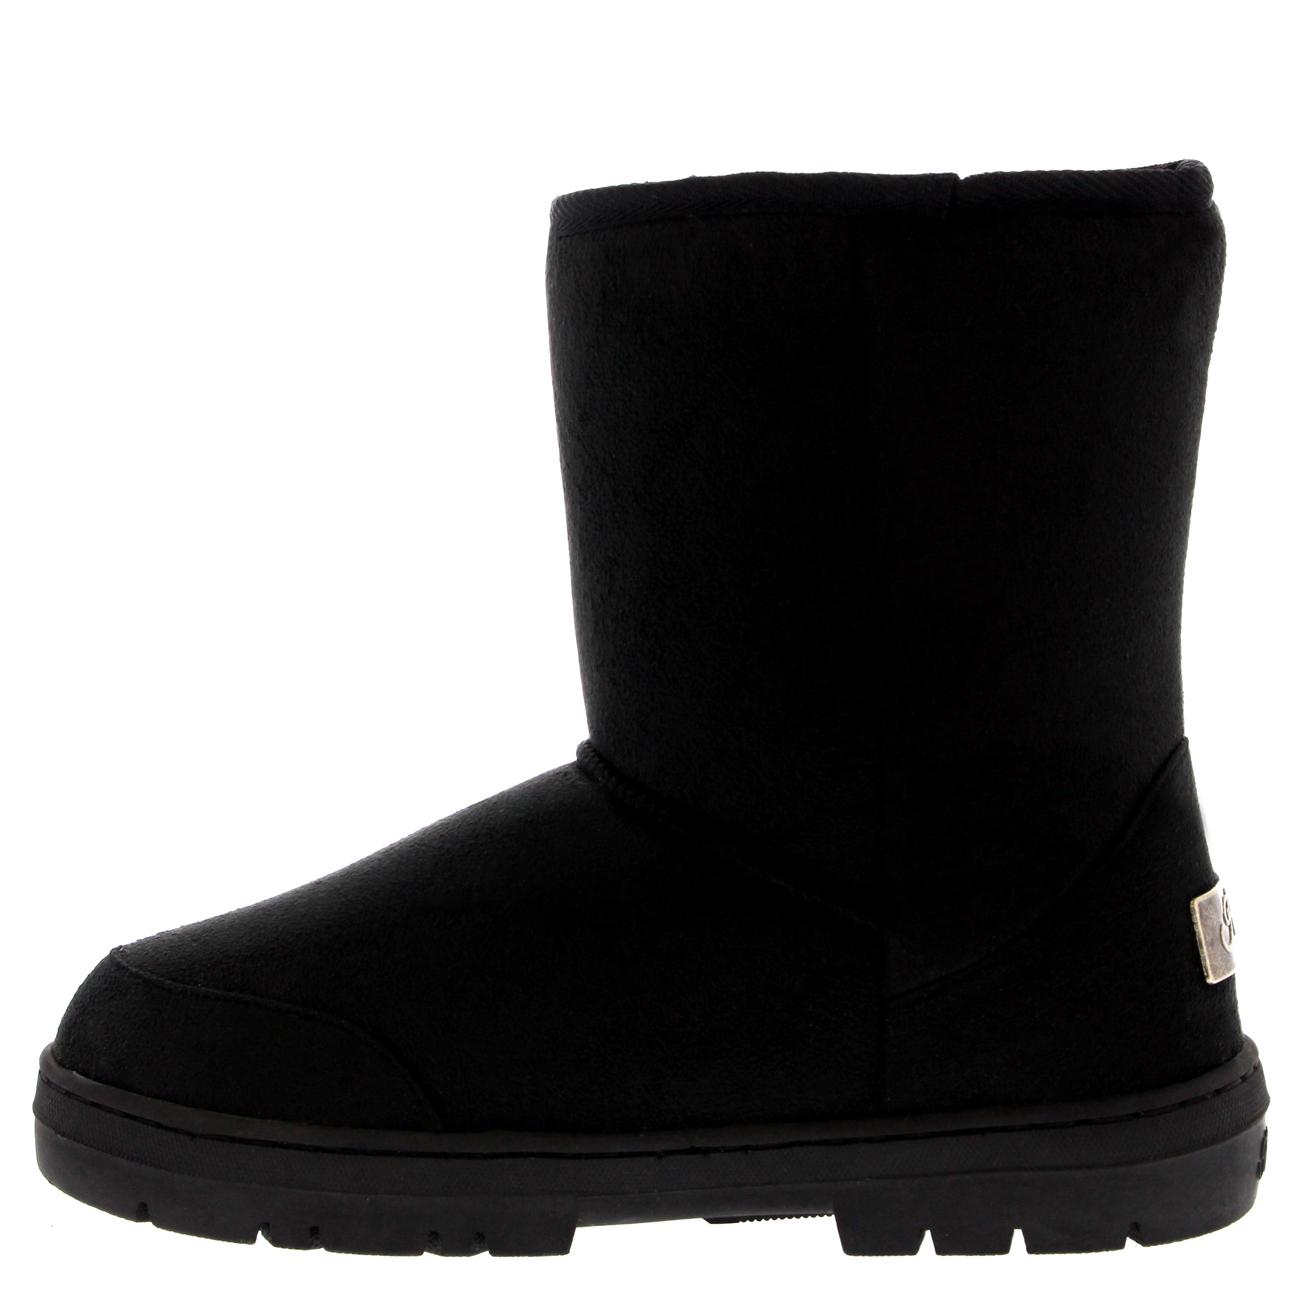 Creative Bearpaw Bearpaw Emma Short Women Suede Brown Winter Boot Boots